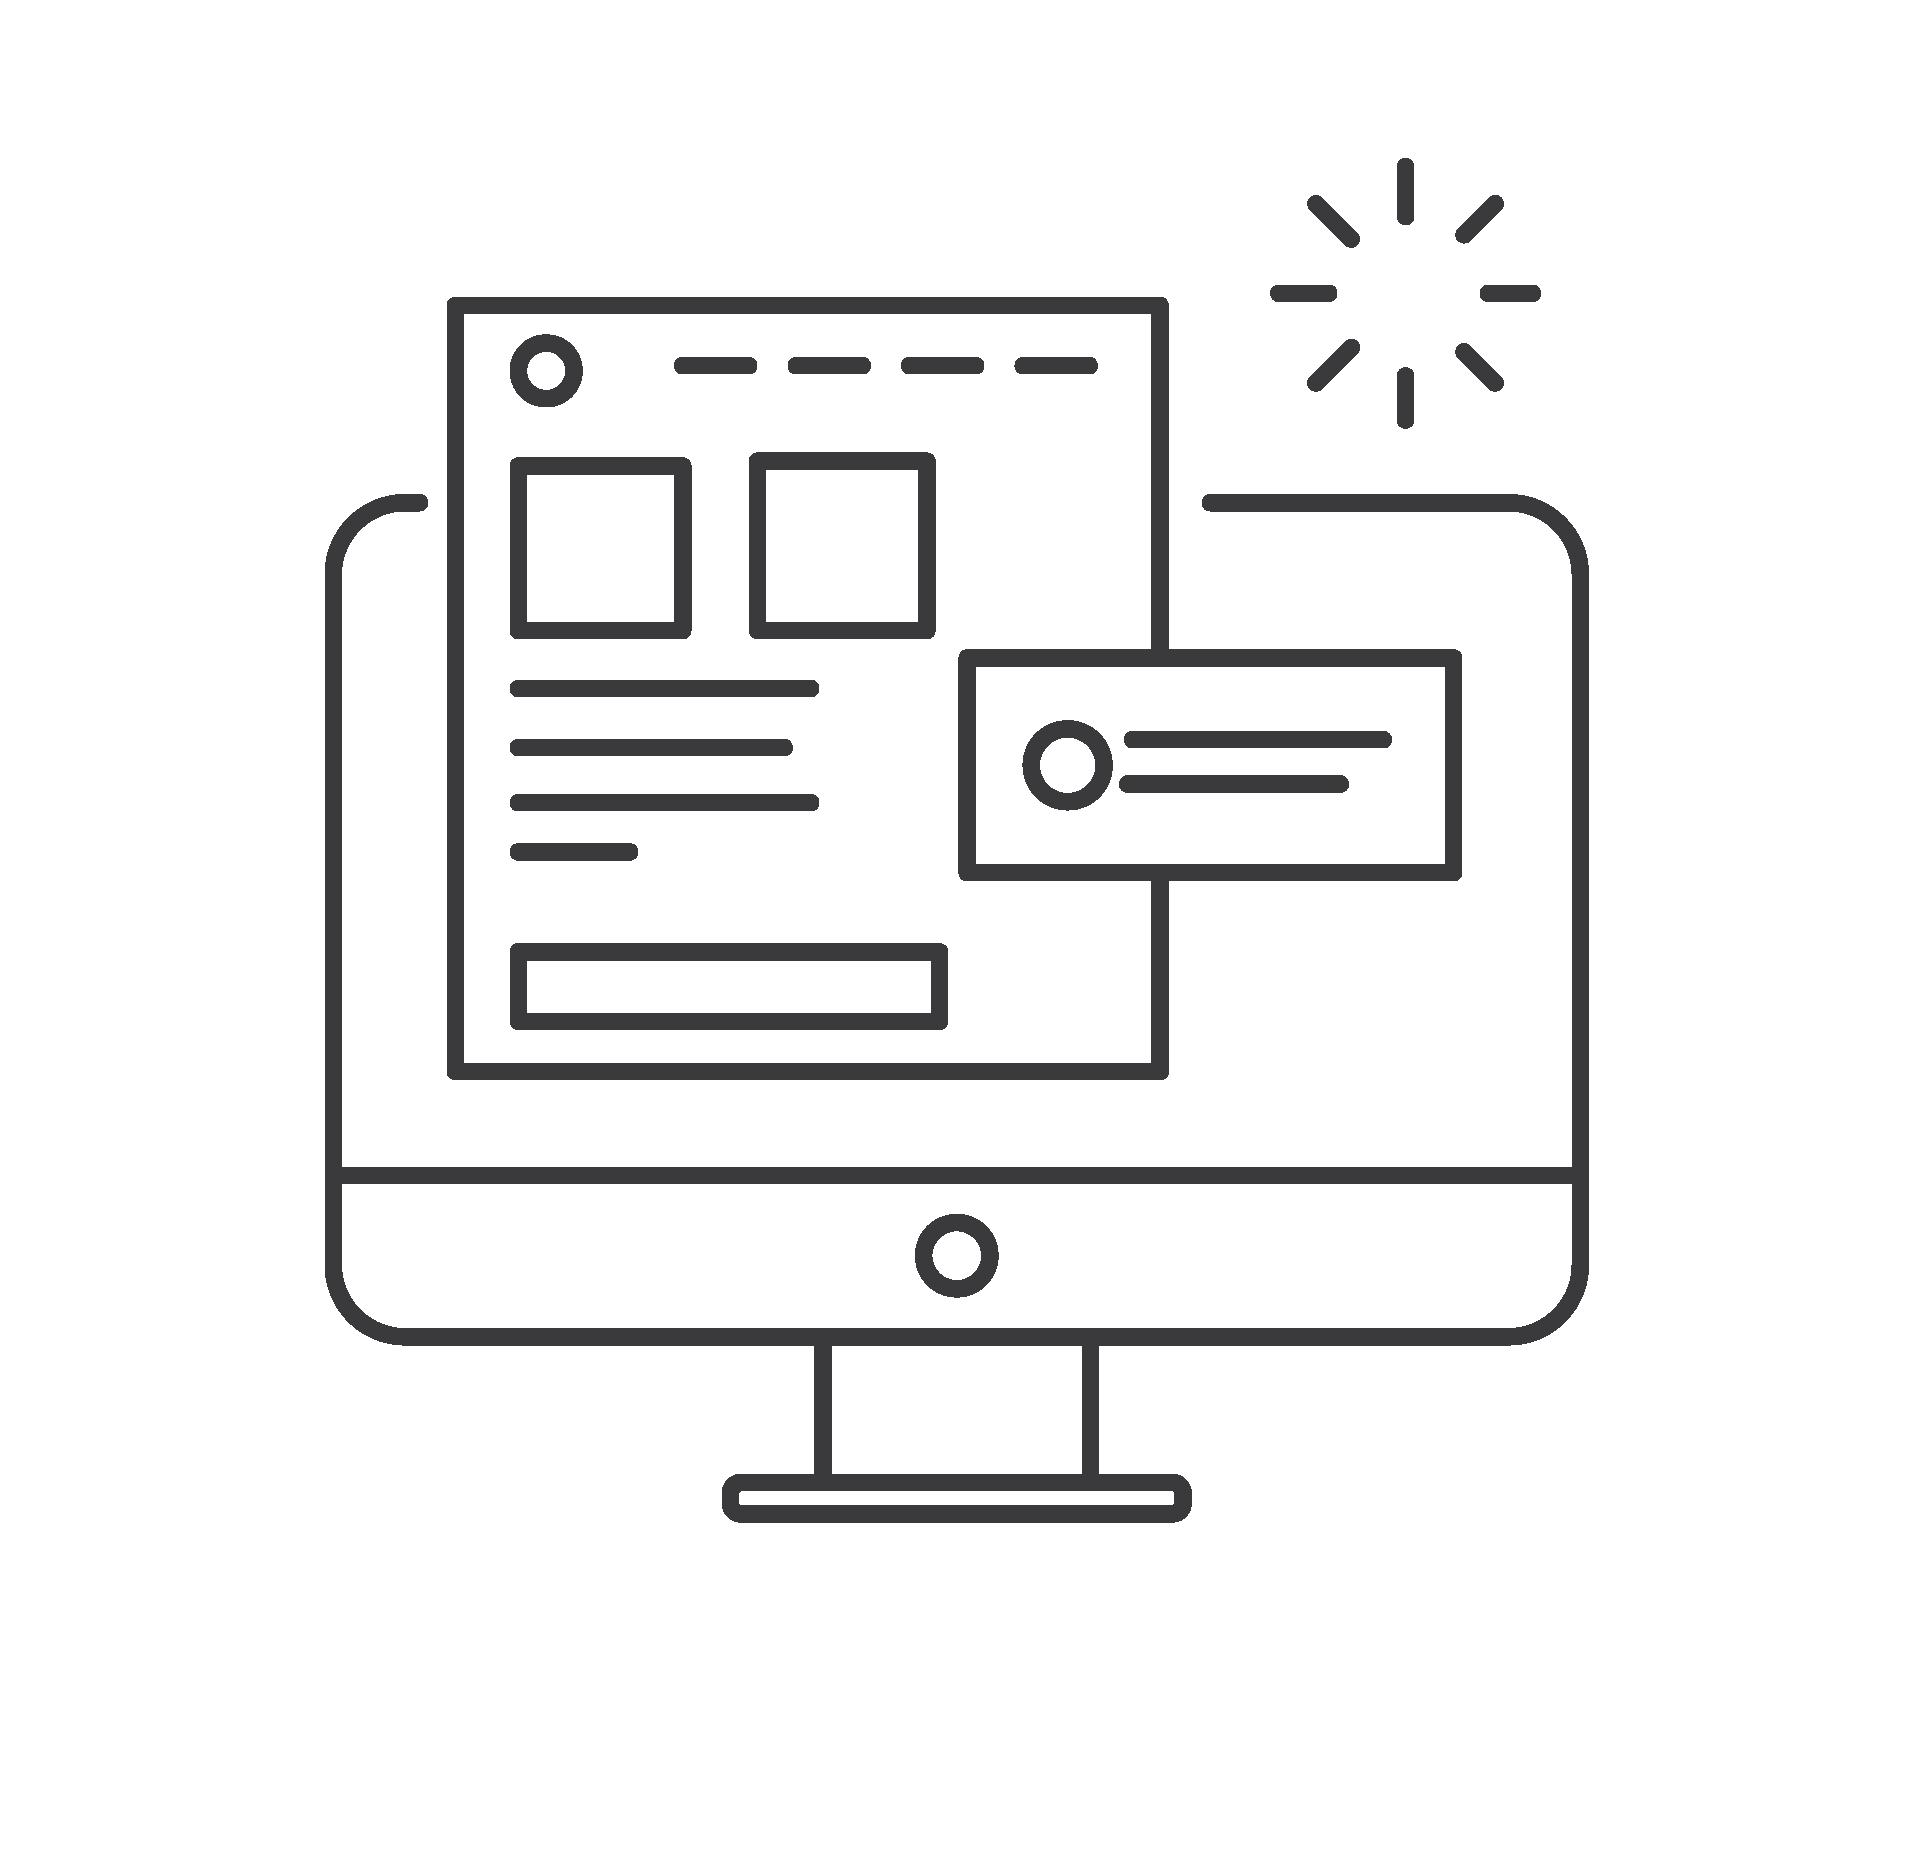 emily-logo-2018_ux-design-icon.png